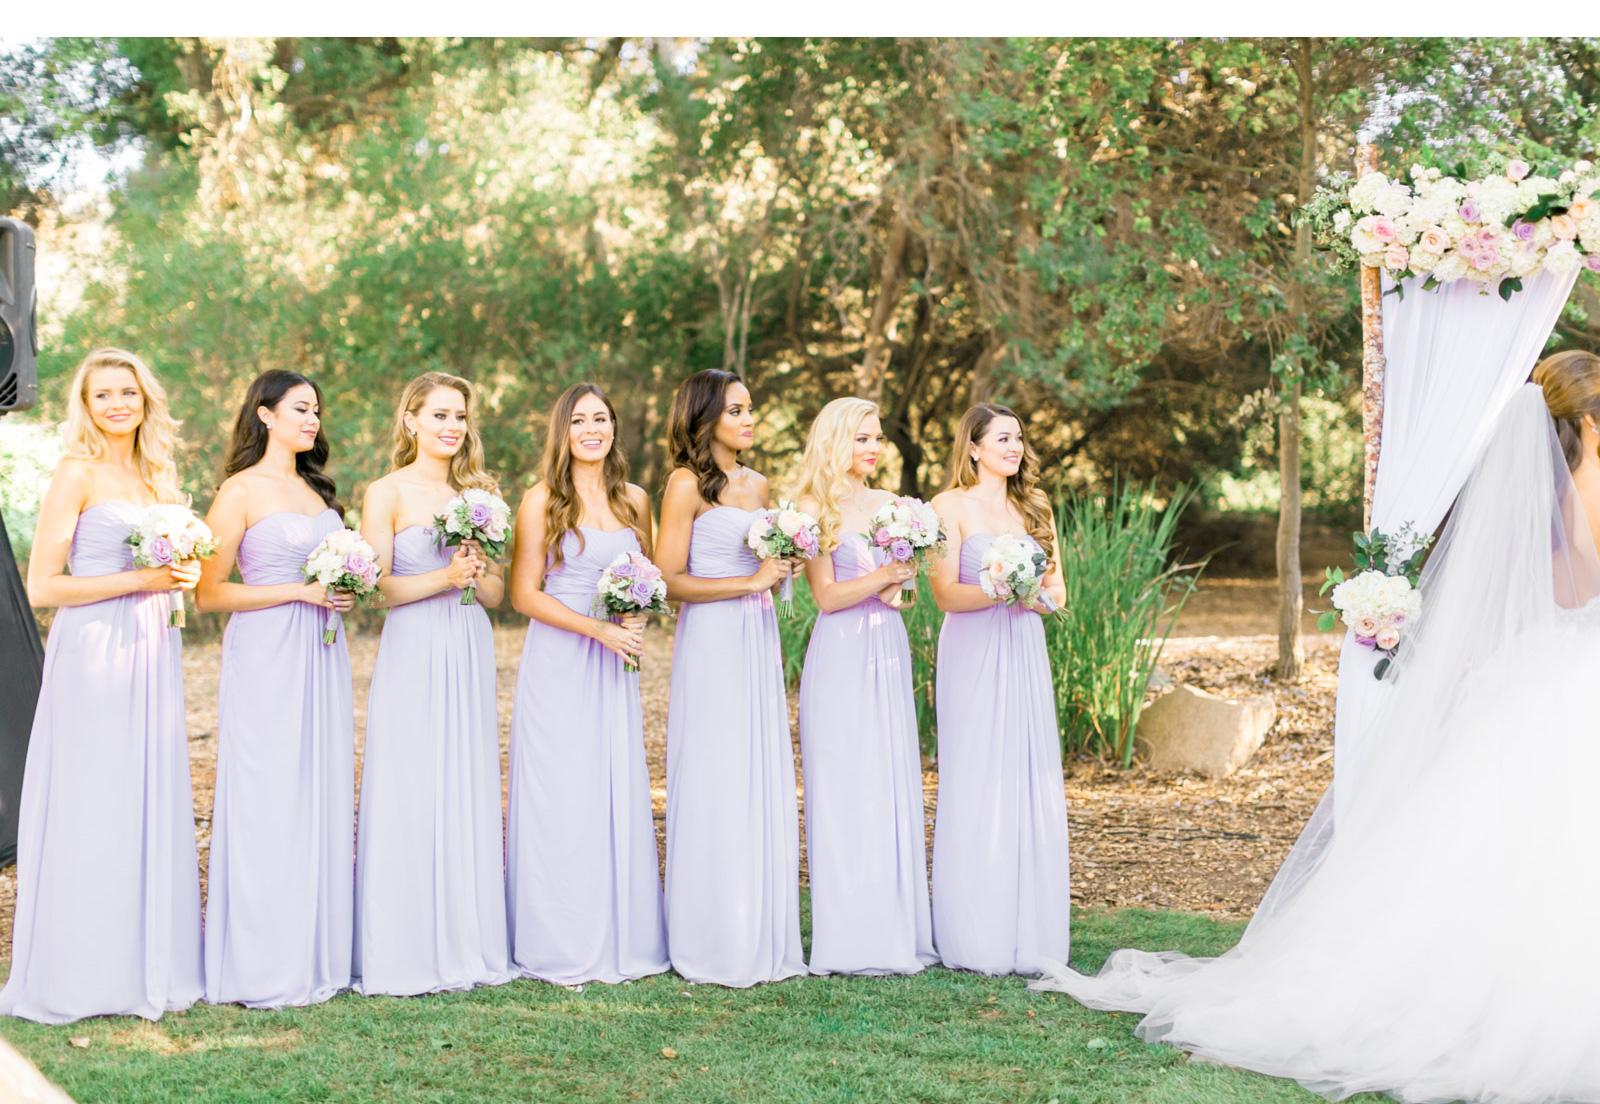 Nia-Sanchez-Wedding-Natalie-Schutt-Photography_08.jpg